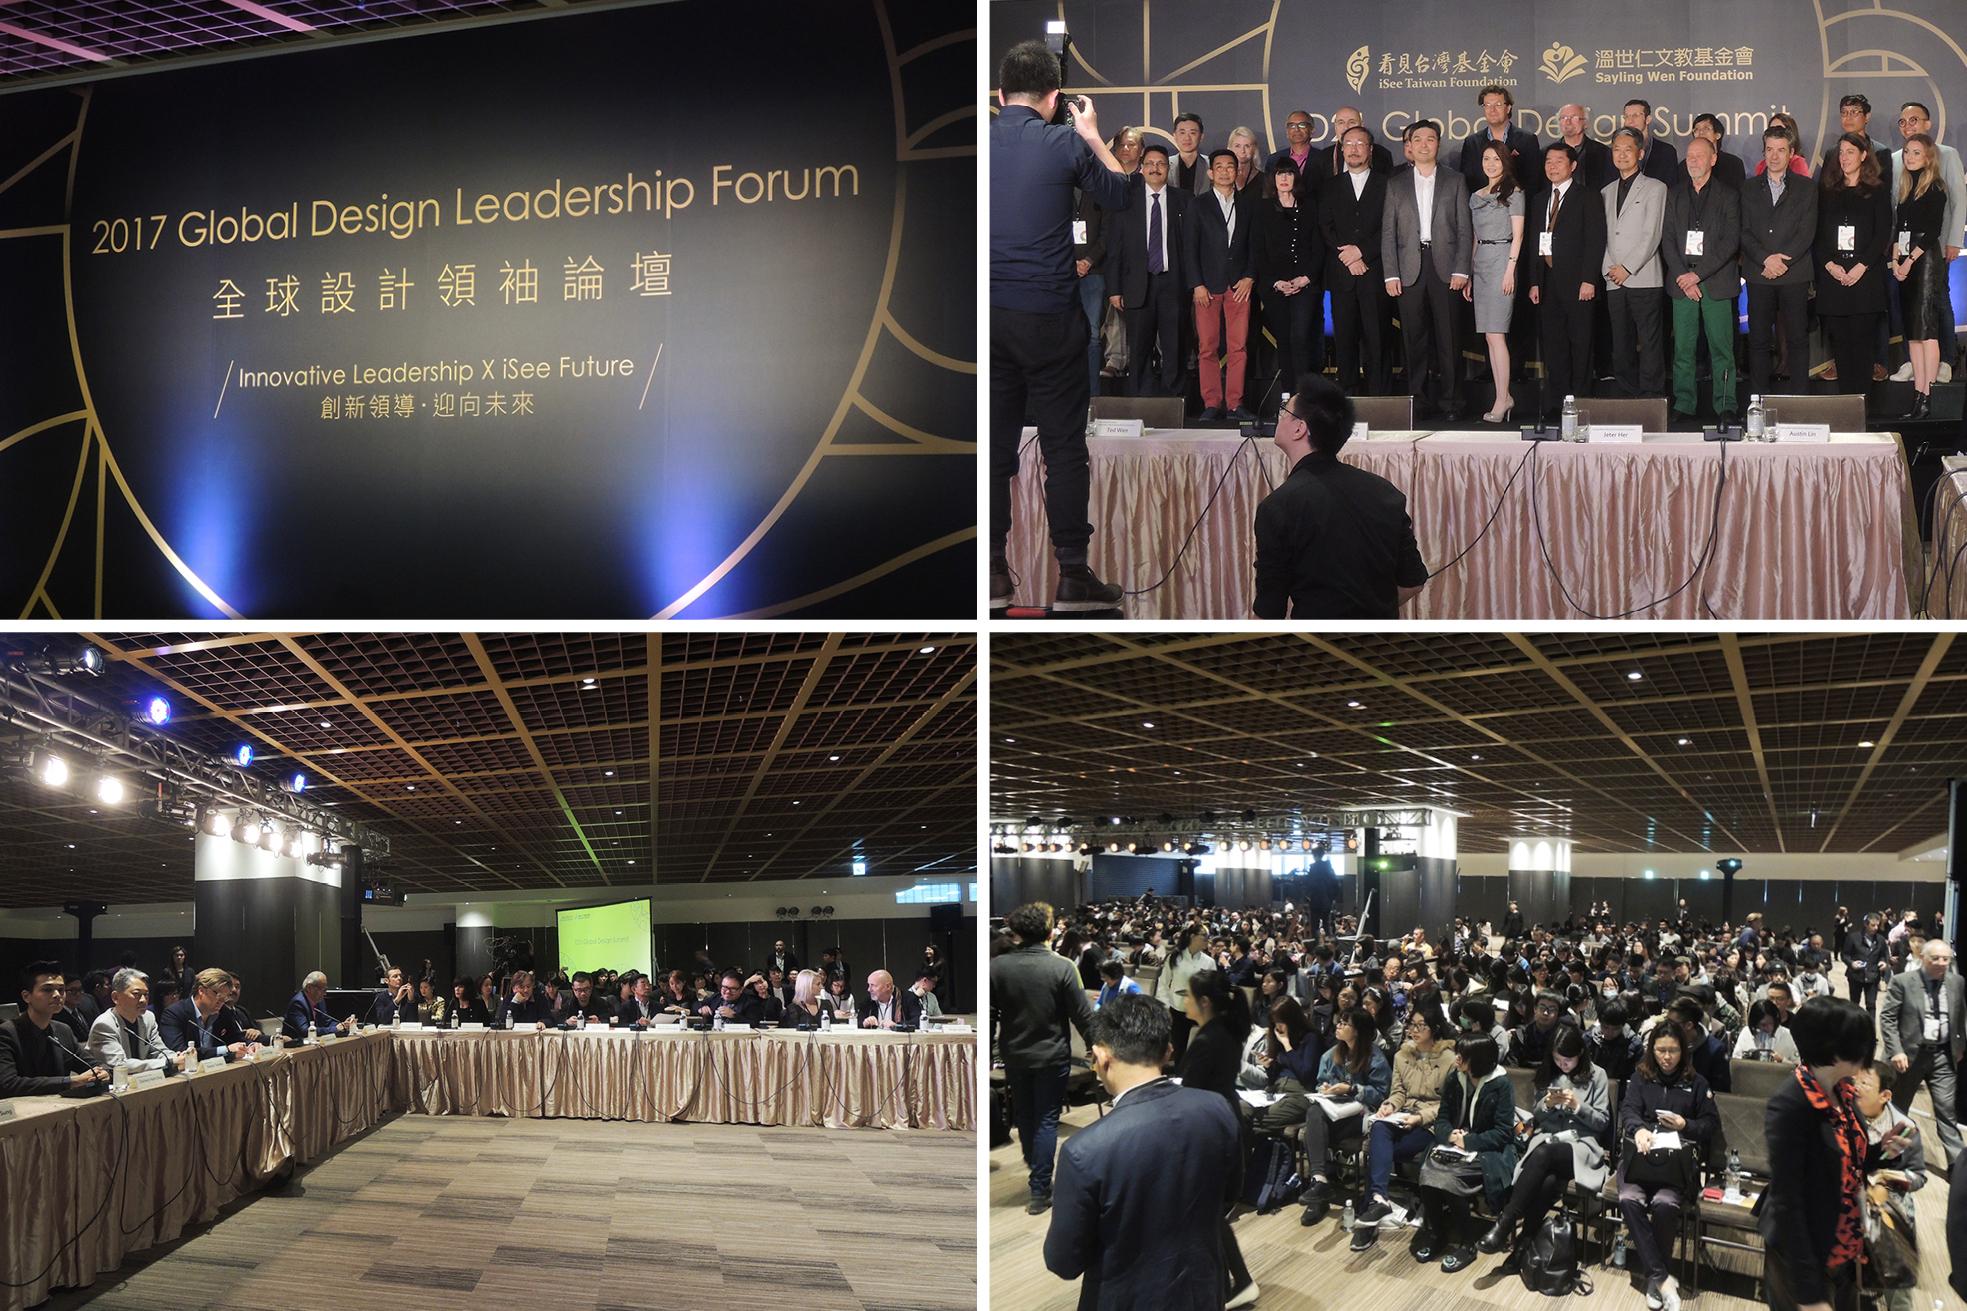 whwWeb_About_whw_Activities_TW_Global Design Leadership Forum.jpg